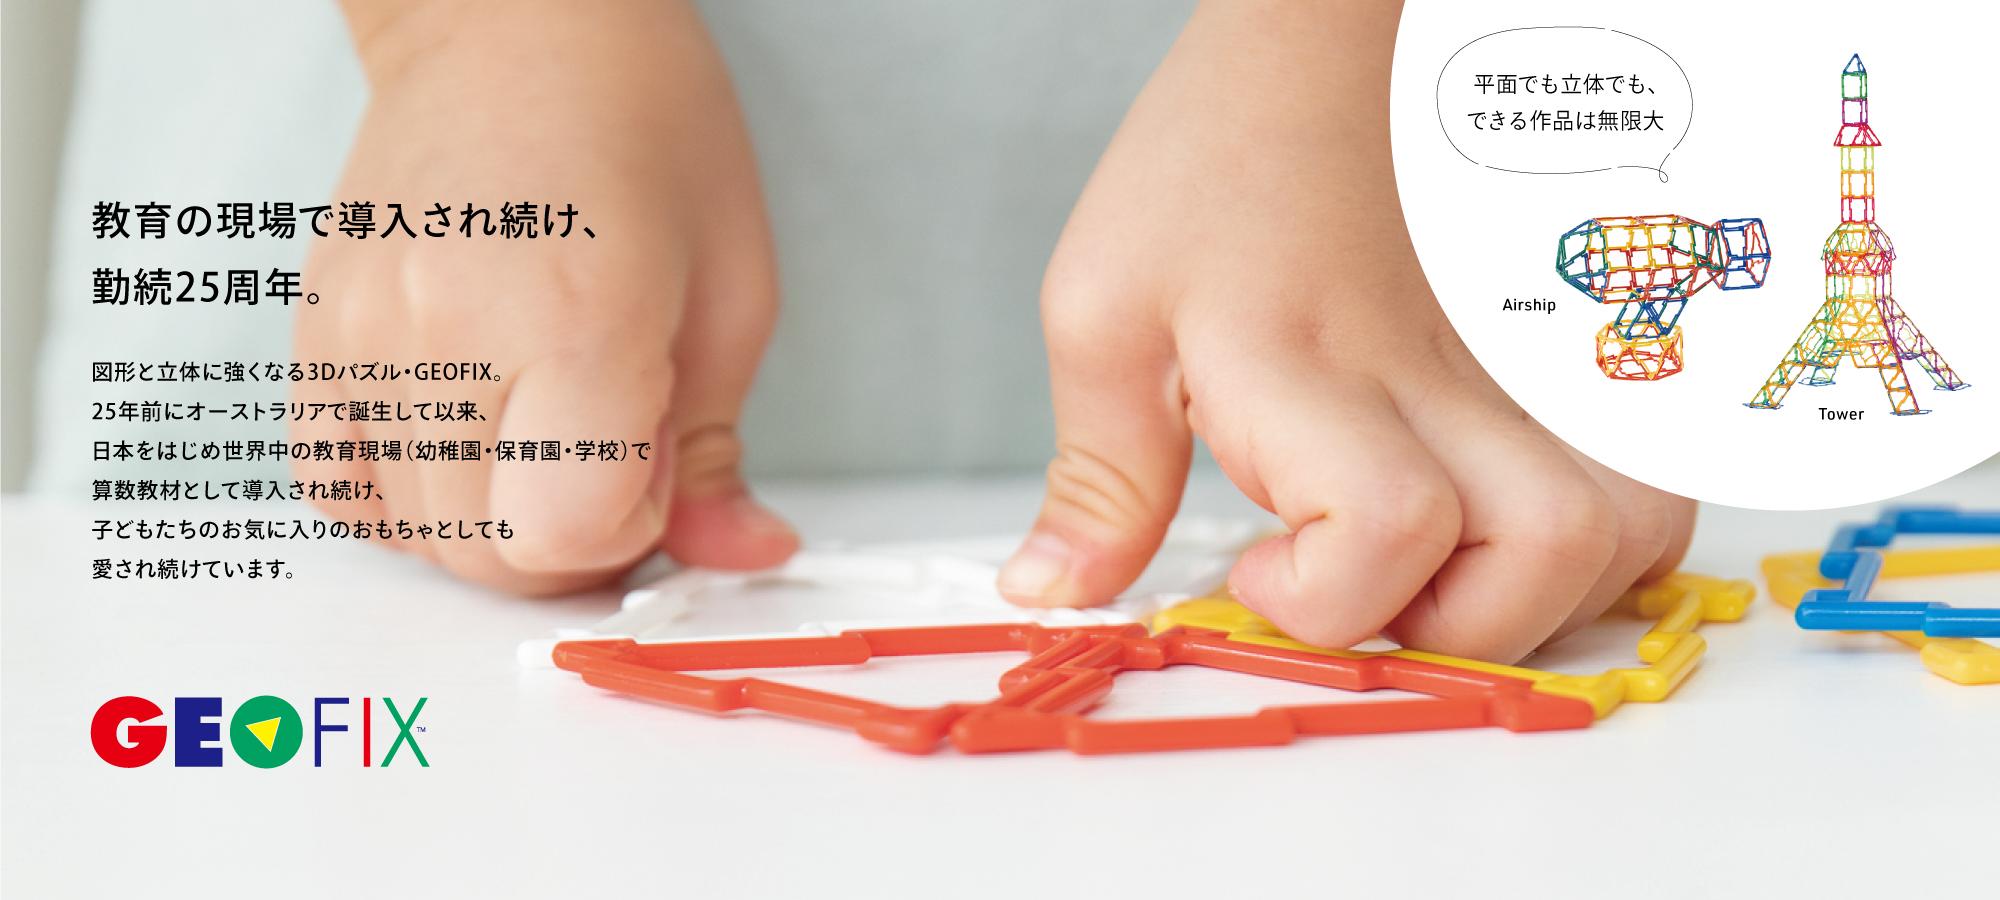 GEOFIX ジオフィクス 図形と立体に強くなる知育玩具